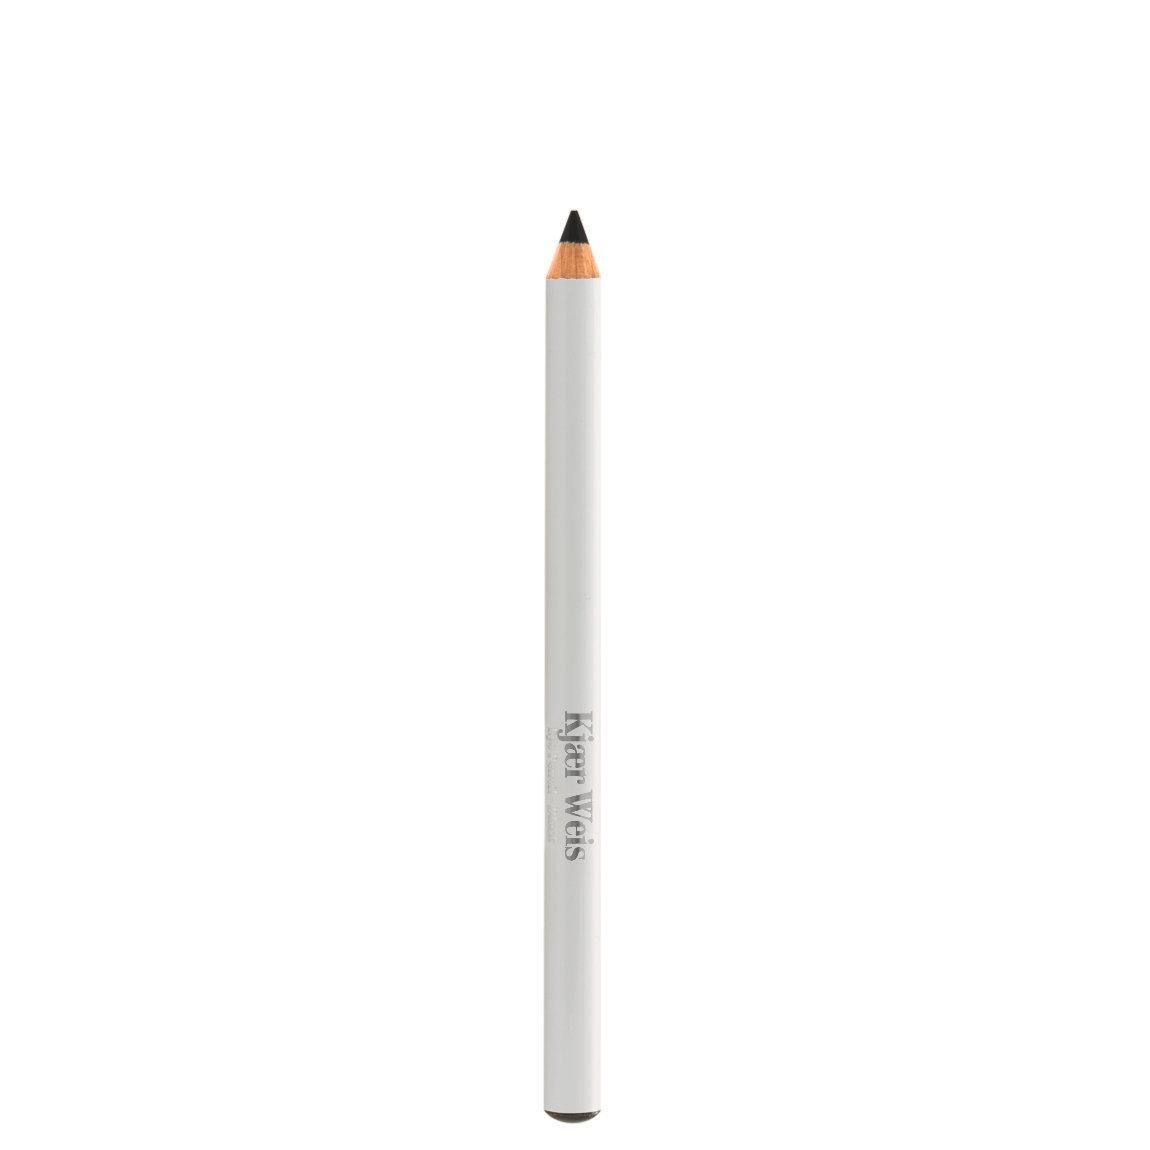 Kjaer Weis Eye Pencil Black